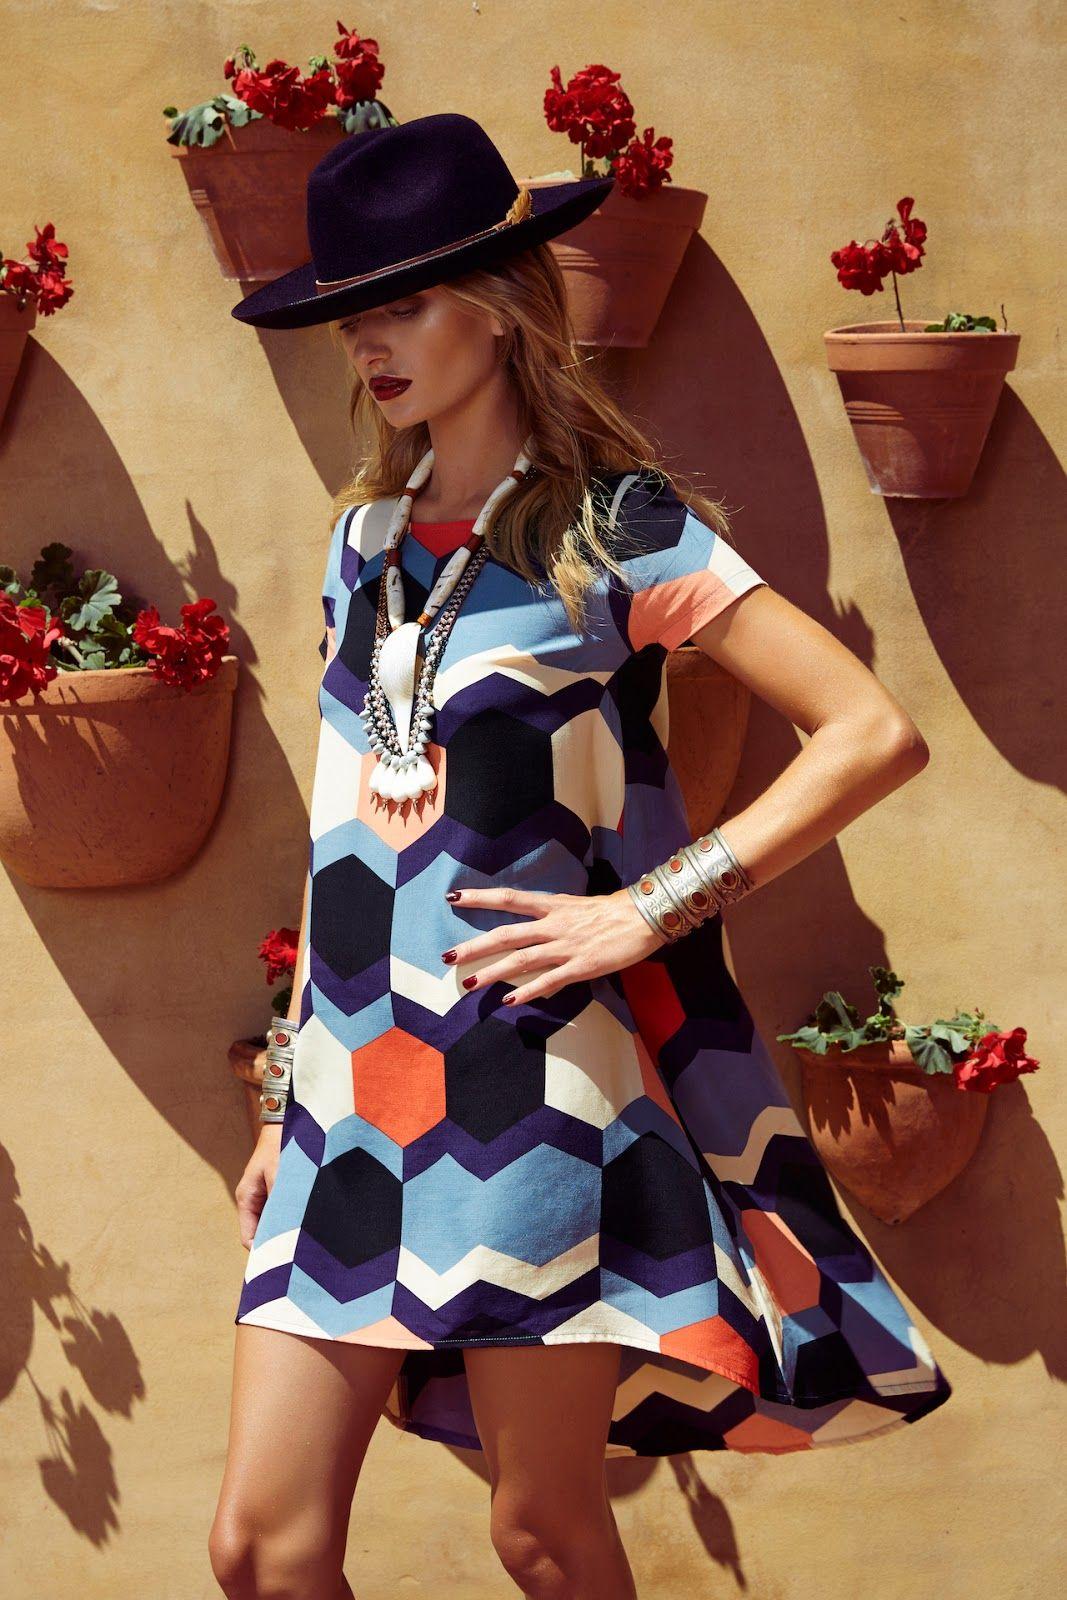 LA HACIENDA Annabella Barber by Amanda Fordyce for Mister Zimi Autumn Winter 2015